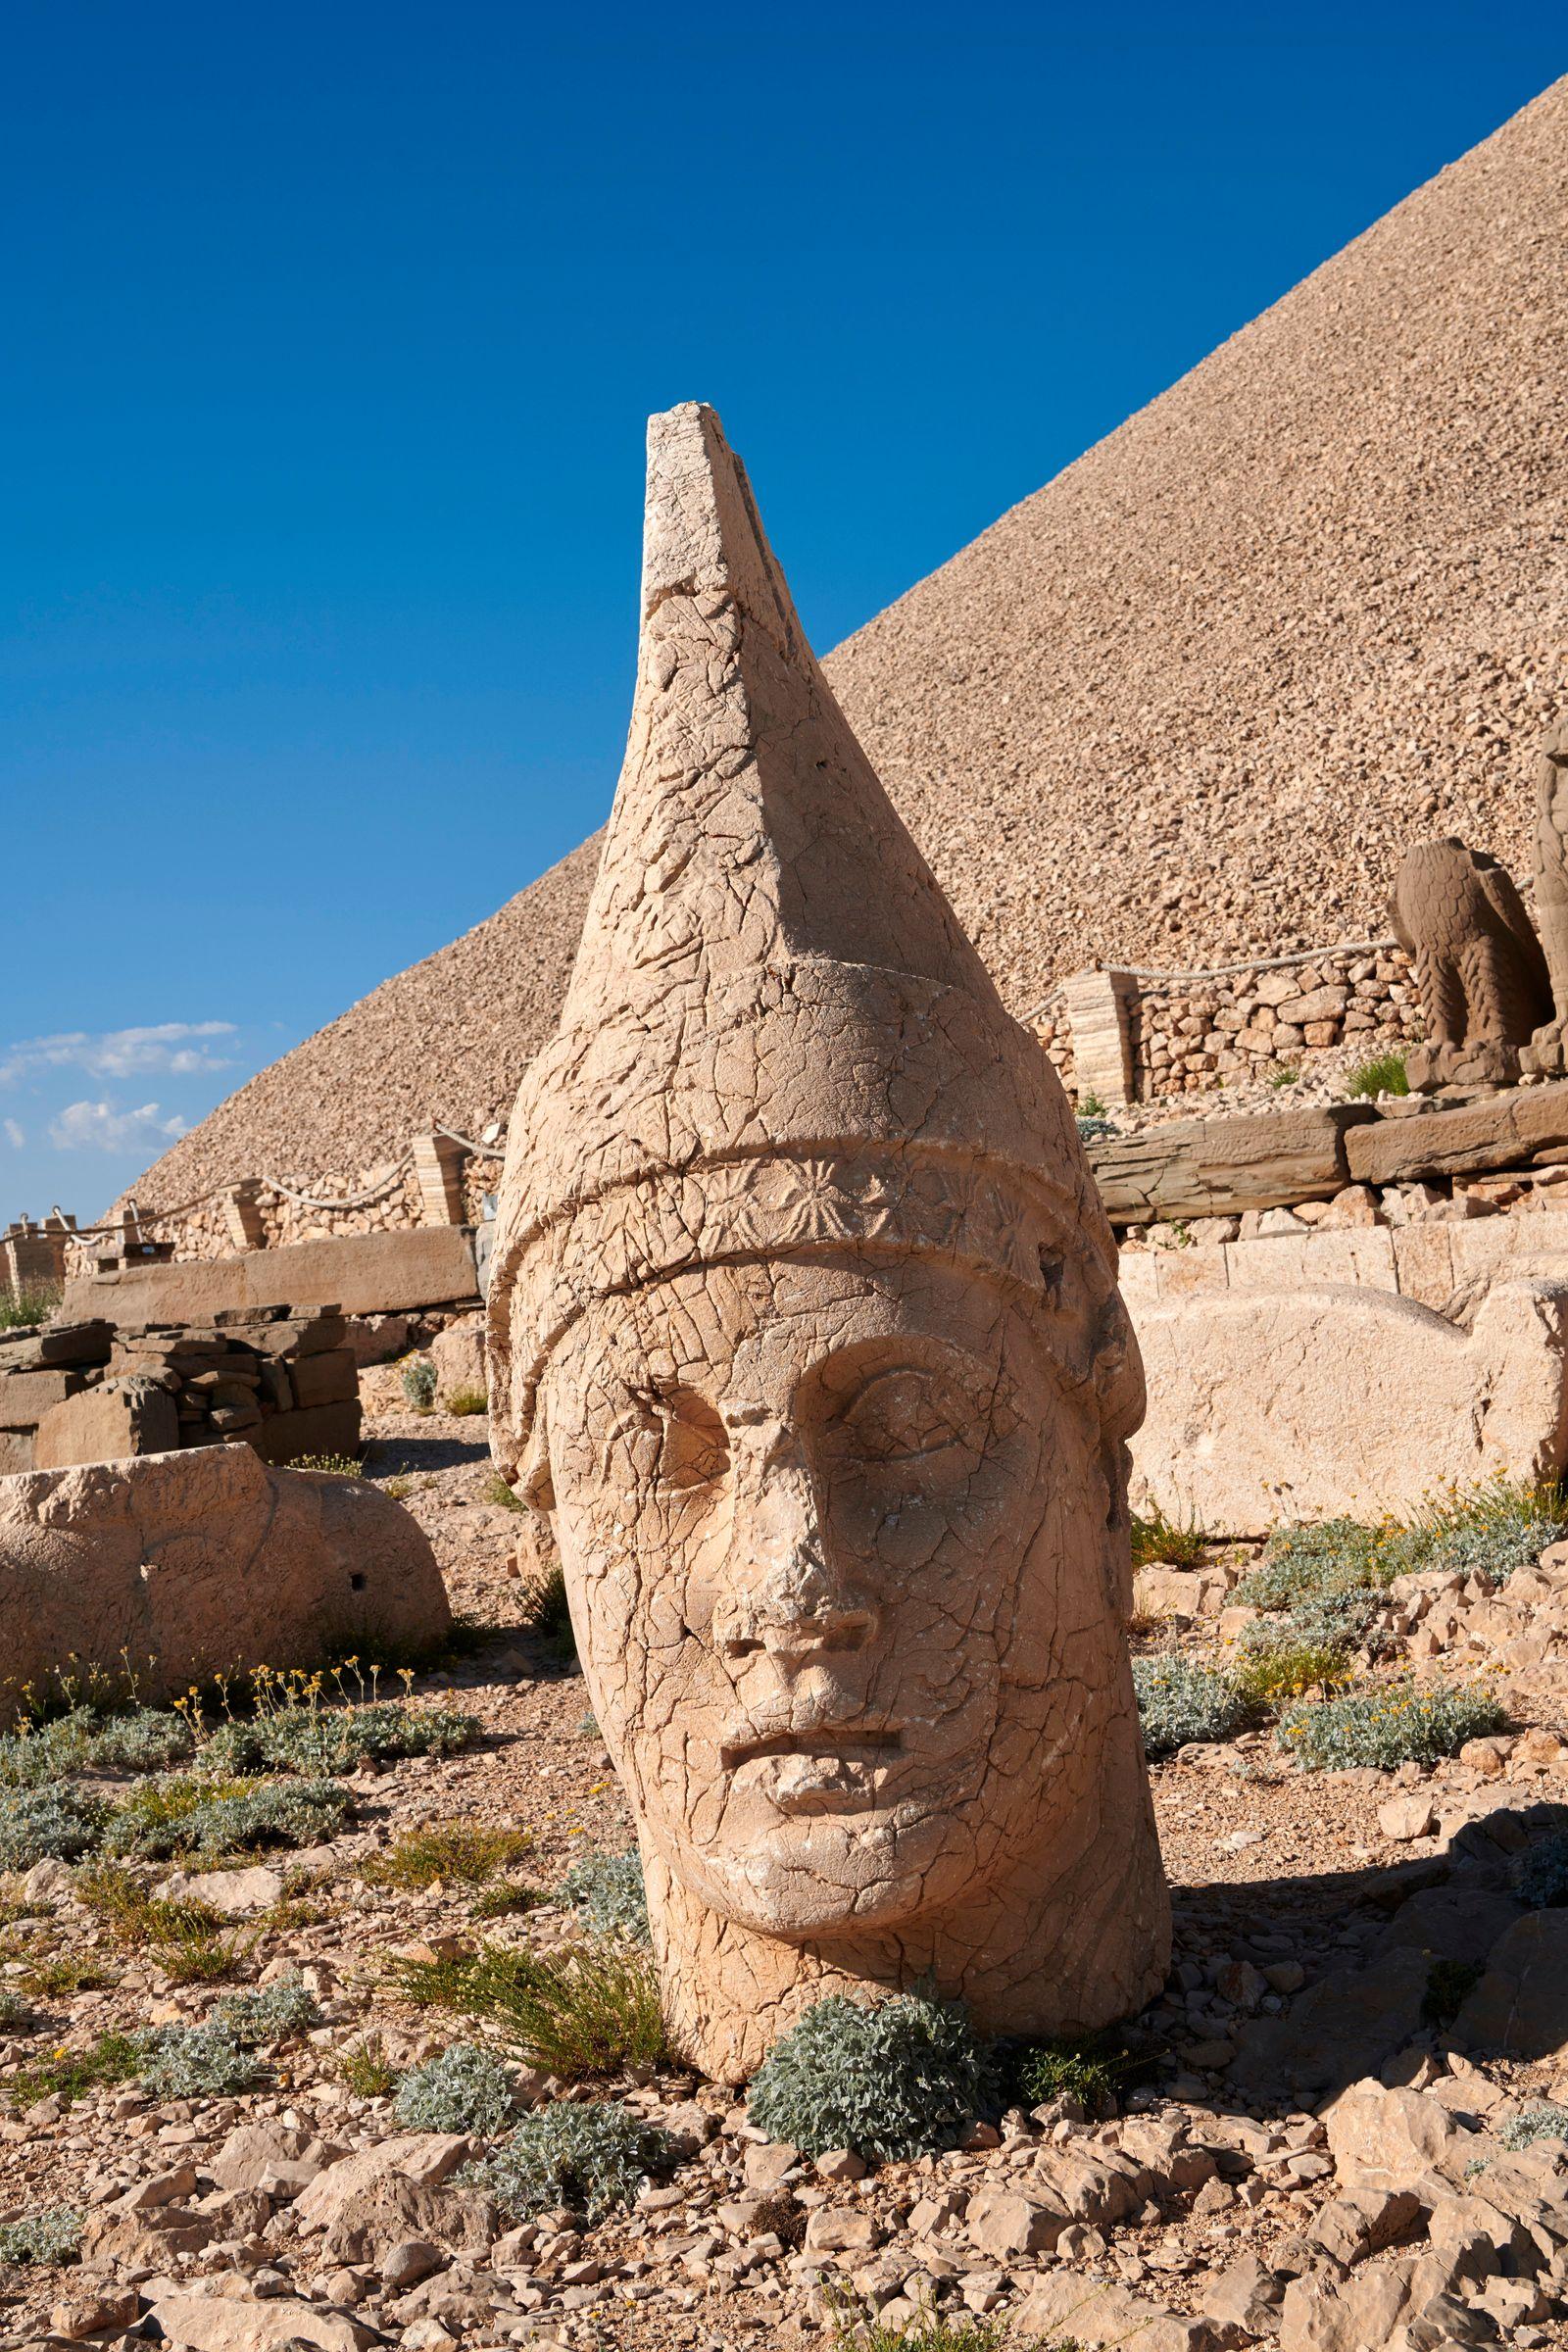 Statue head of Antiochus, the 62 BC Royal Tomb of King Antiochus I Theos of Commagene, west Terrace, Mount Nemrut or Nemrud Dagi summit, near Adıyaman, Turkey. (Funkystock)